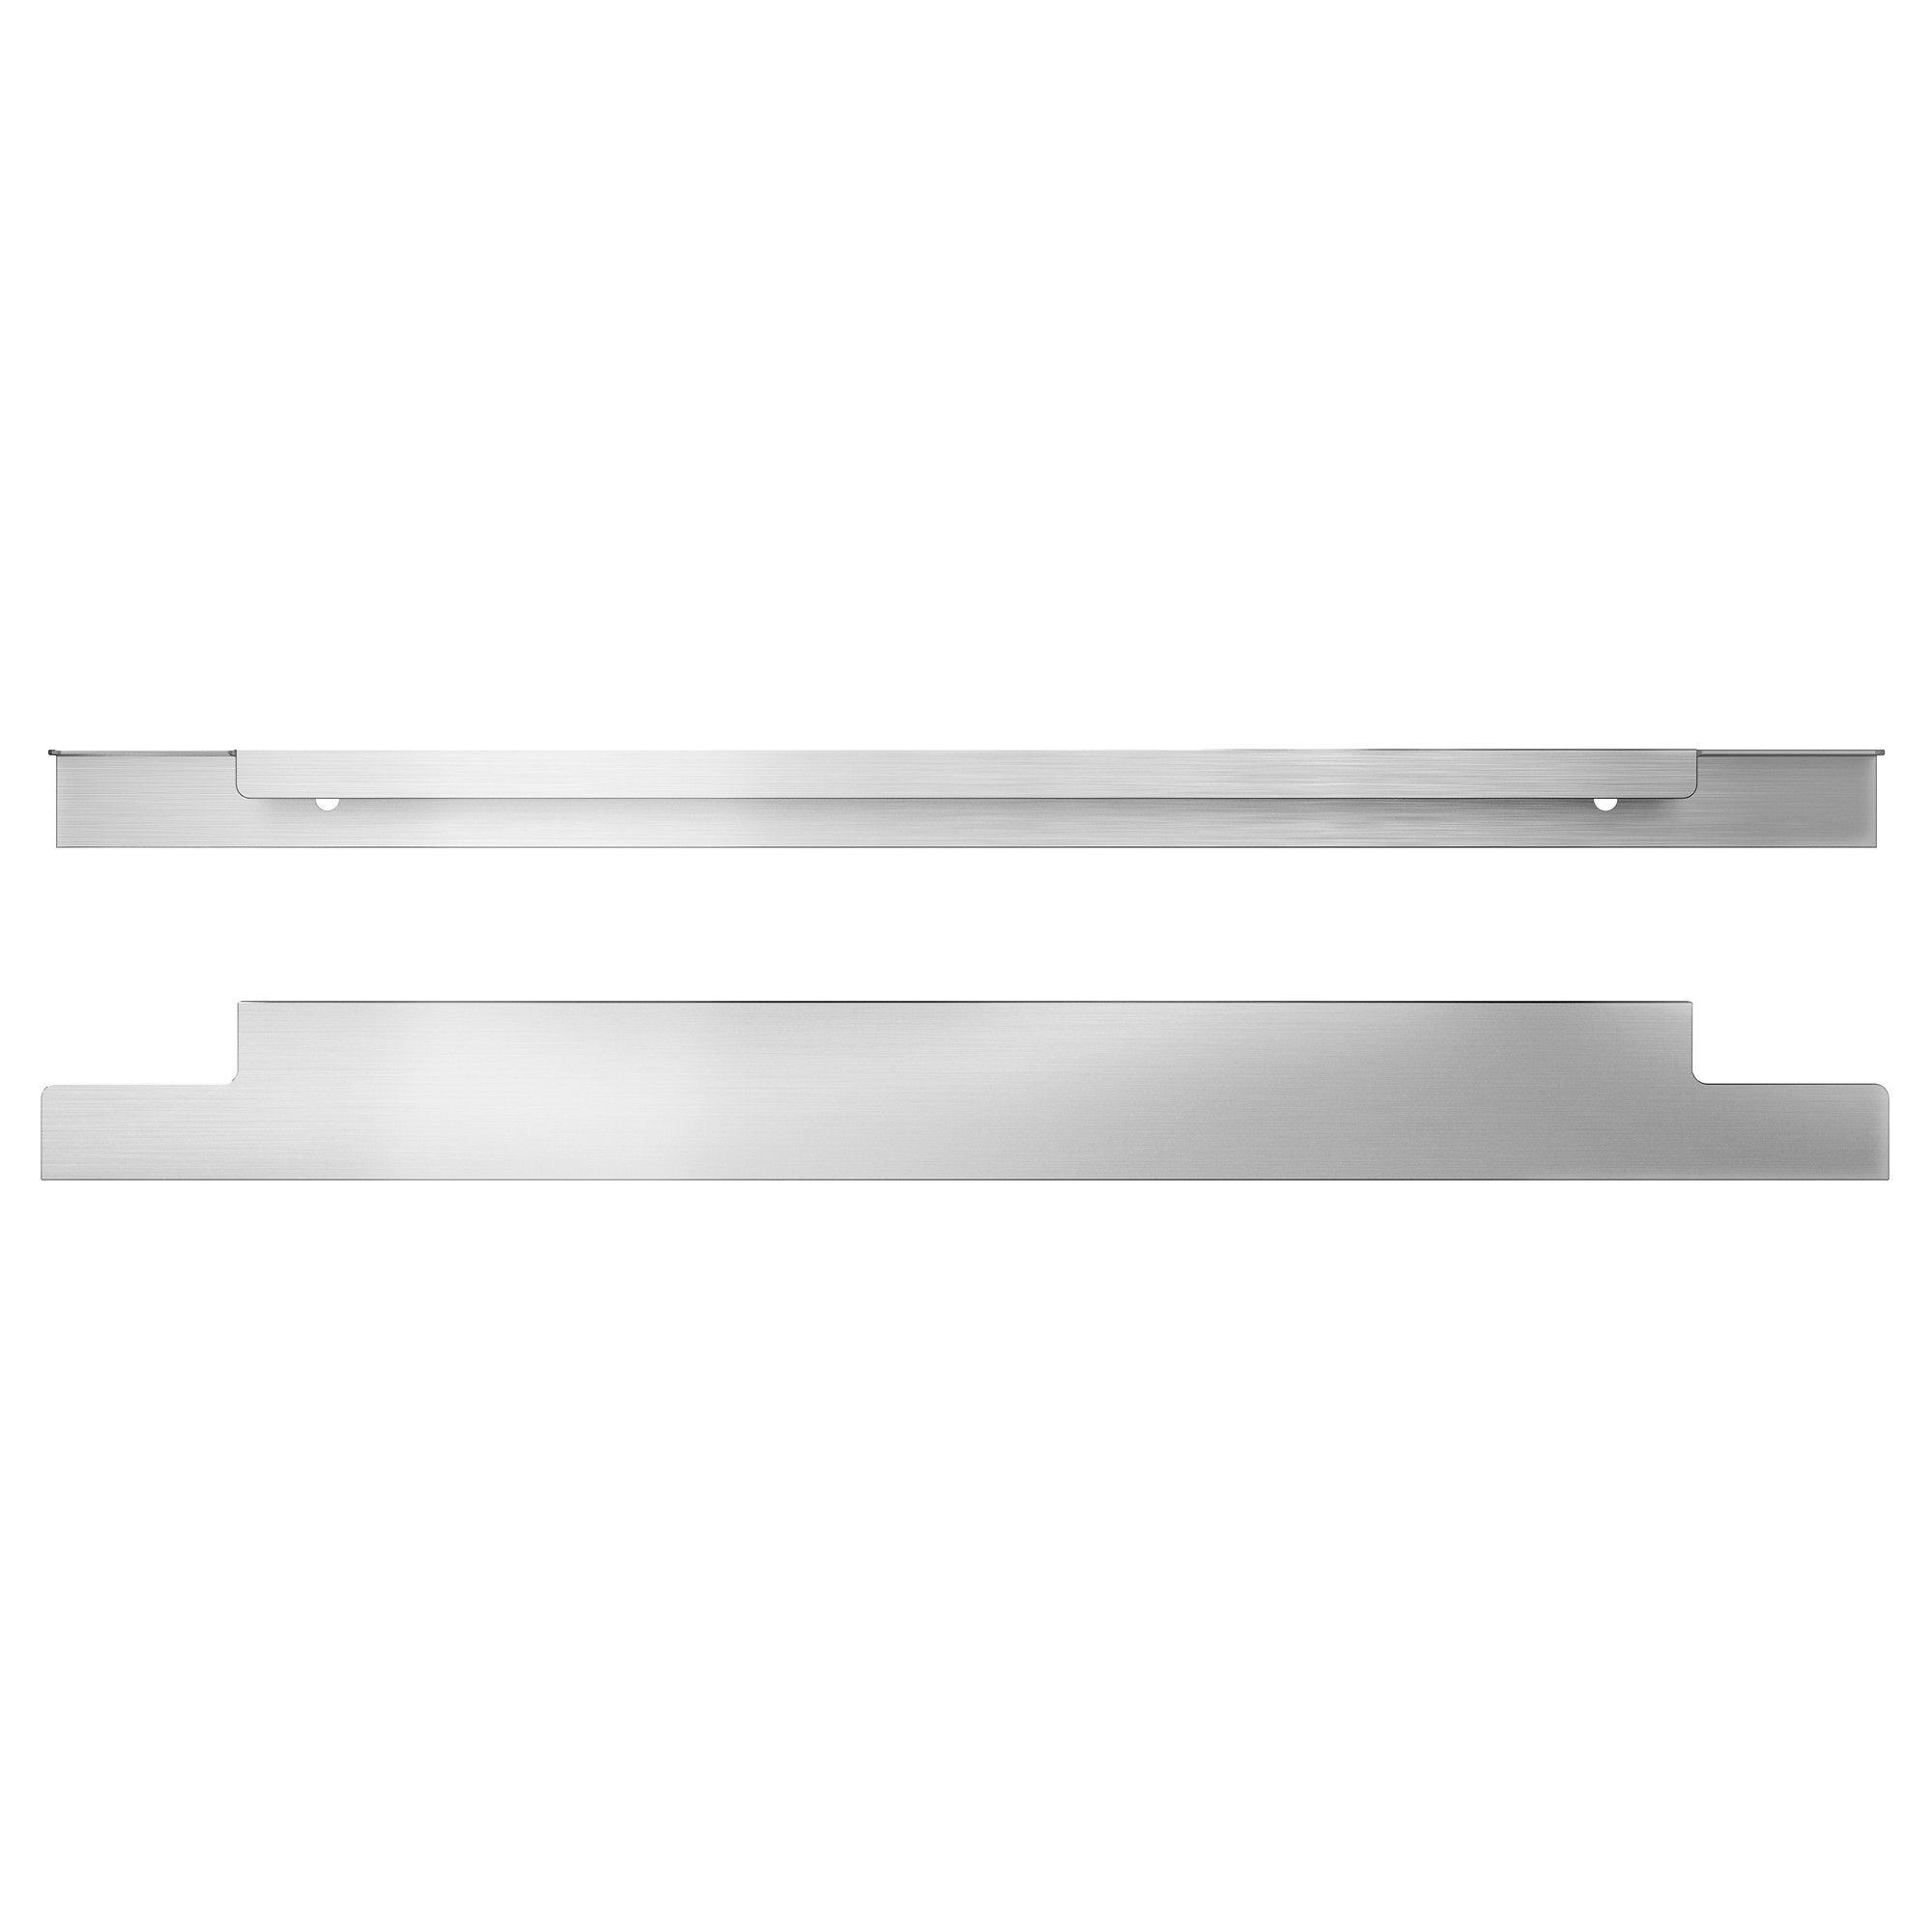 Kitchen Cabinet Handles Ikea: BLANKETT Handle, Aluminum